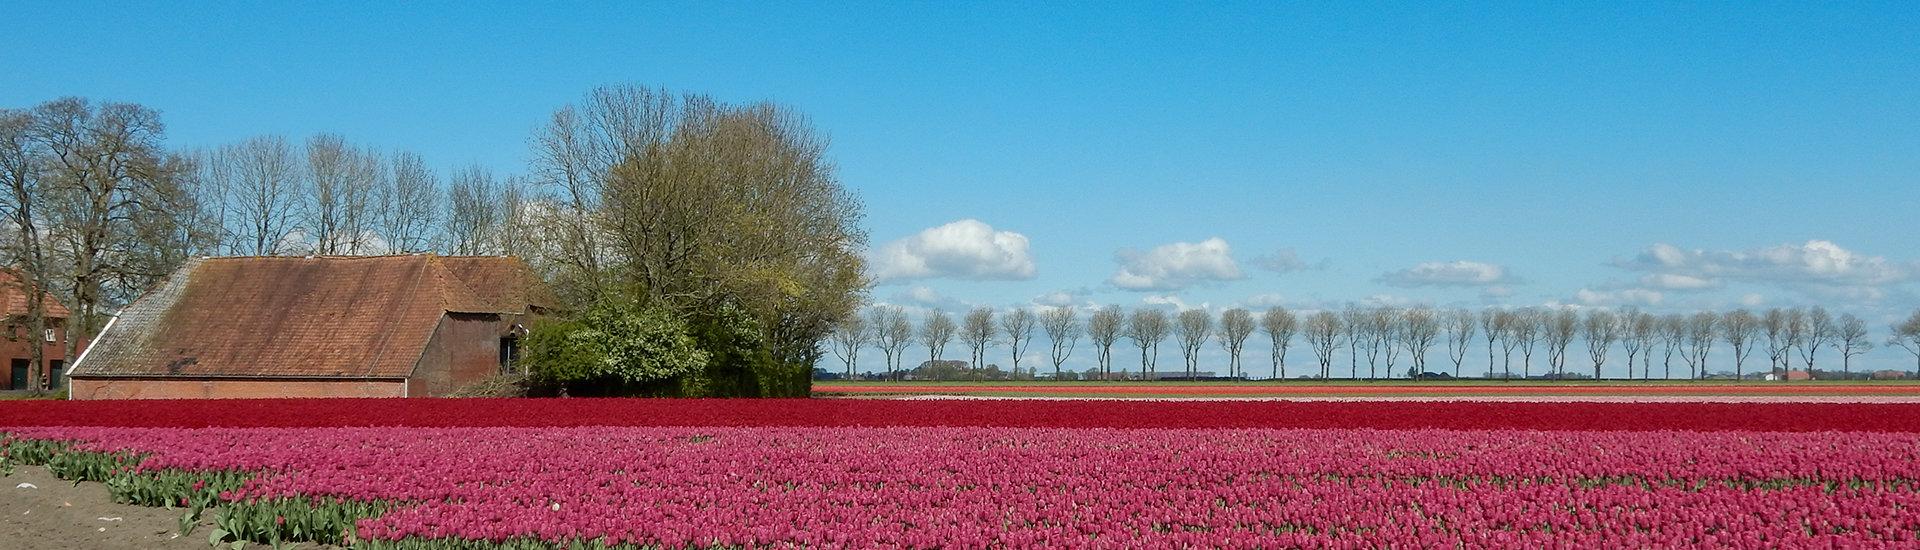 Tulpenveld met boerderij